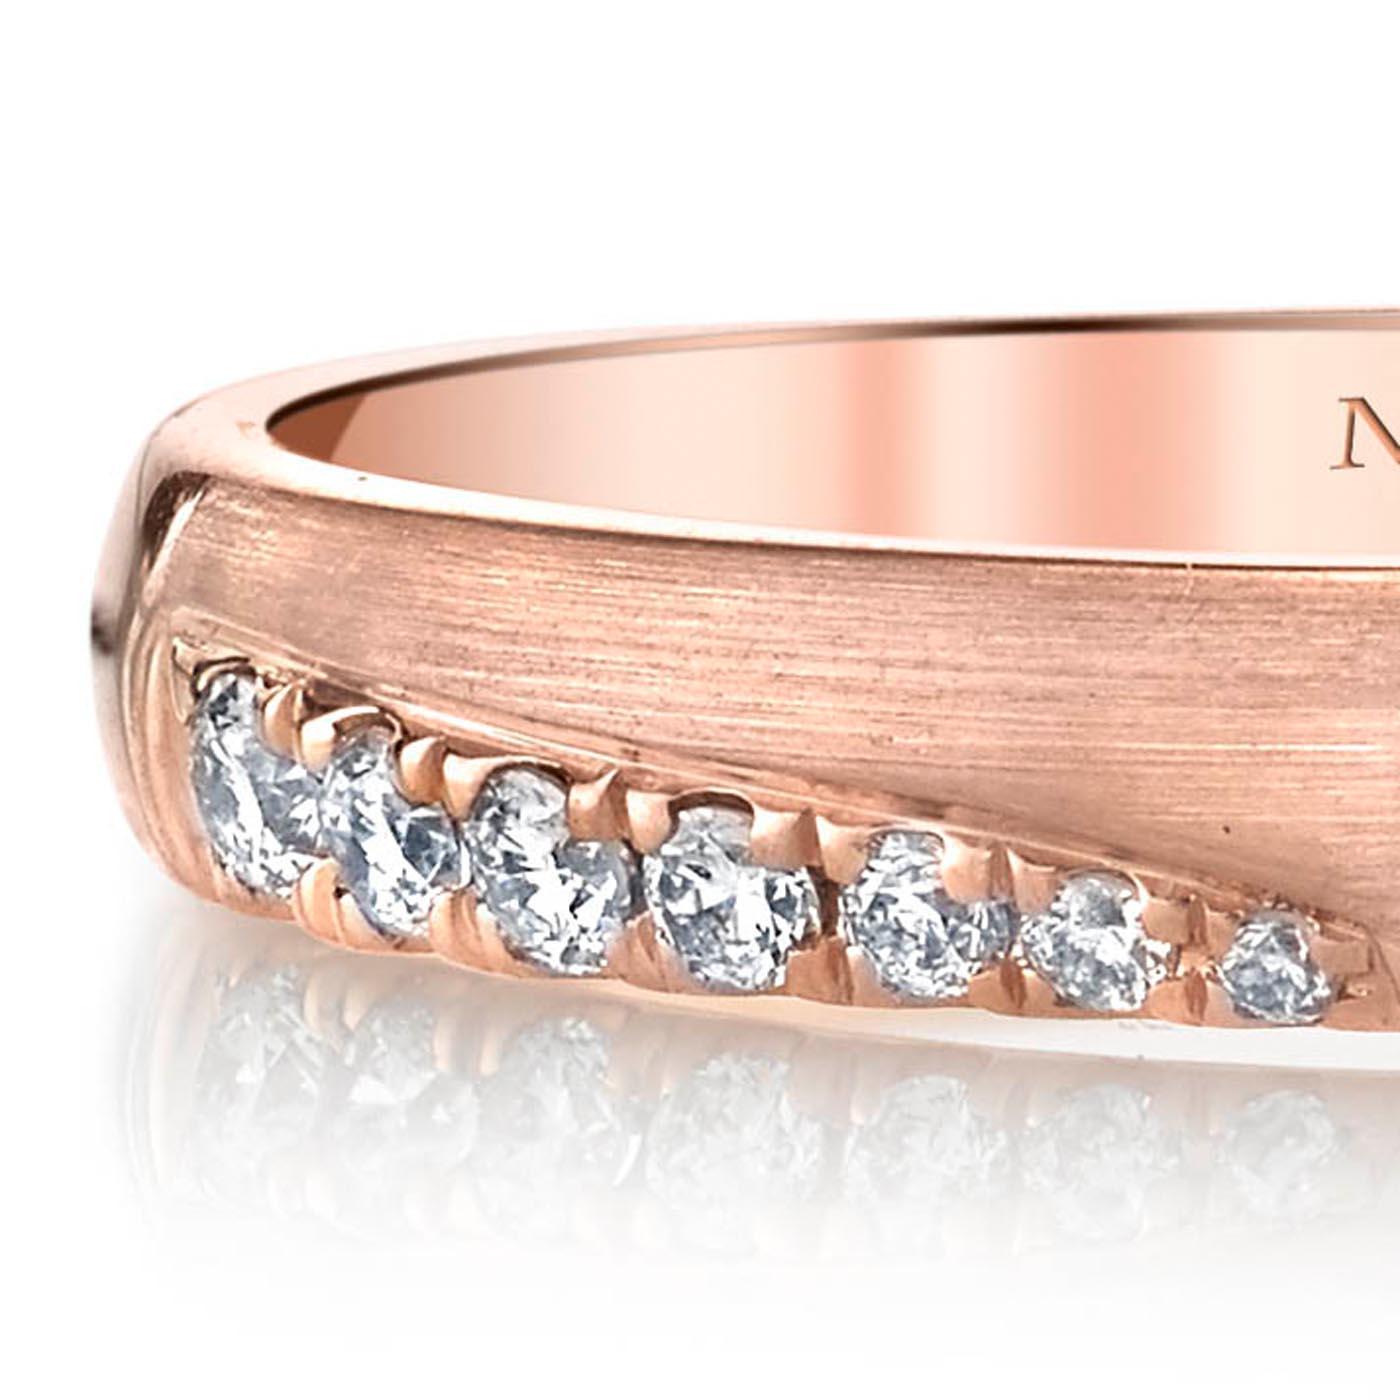 Diamond Ring - Fashion Band Style #: MARS-26891